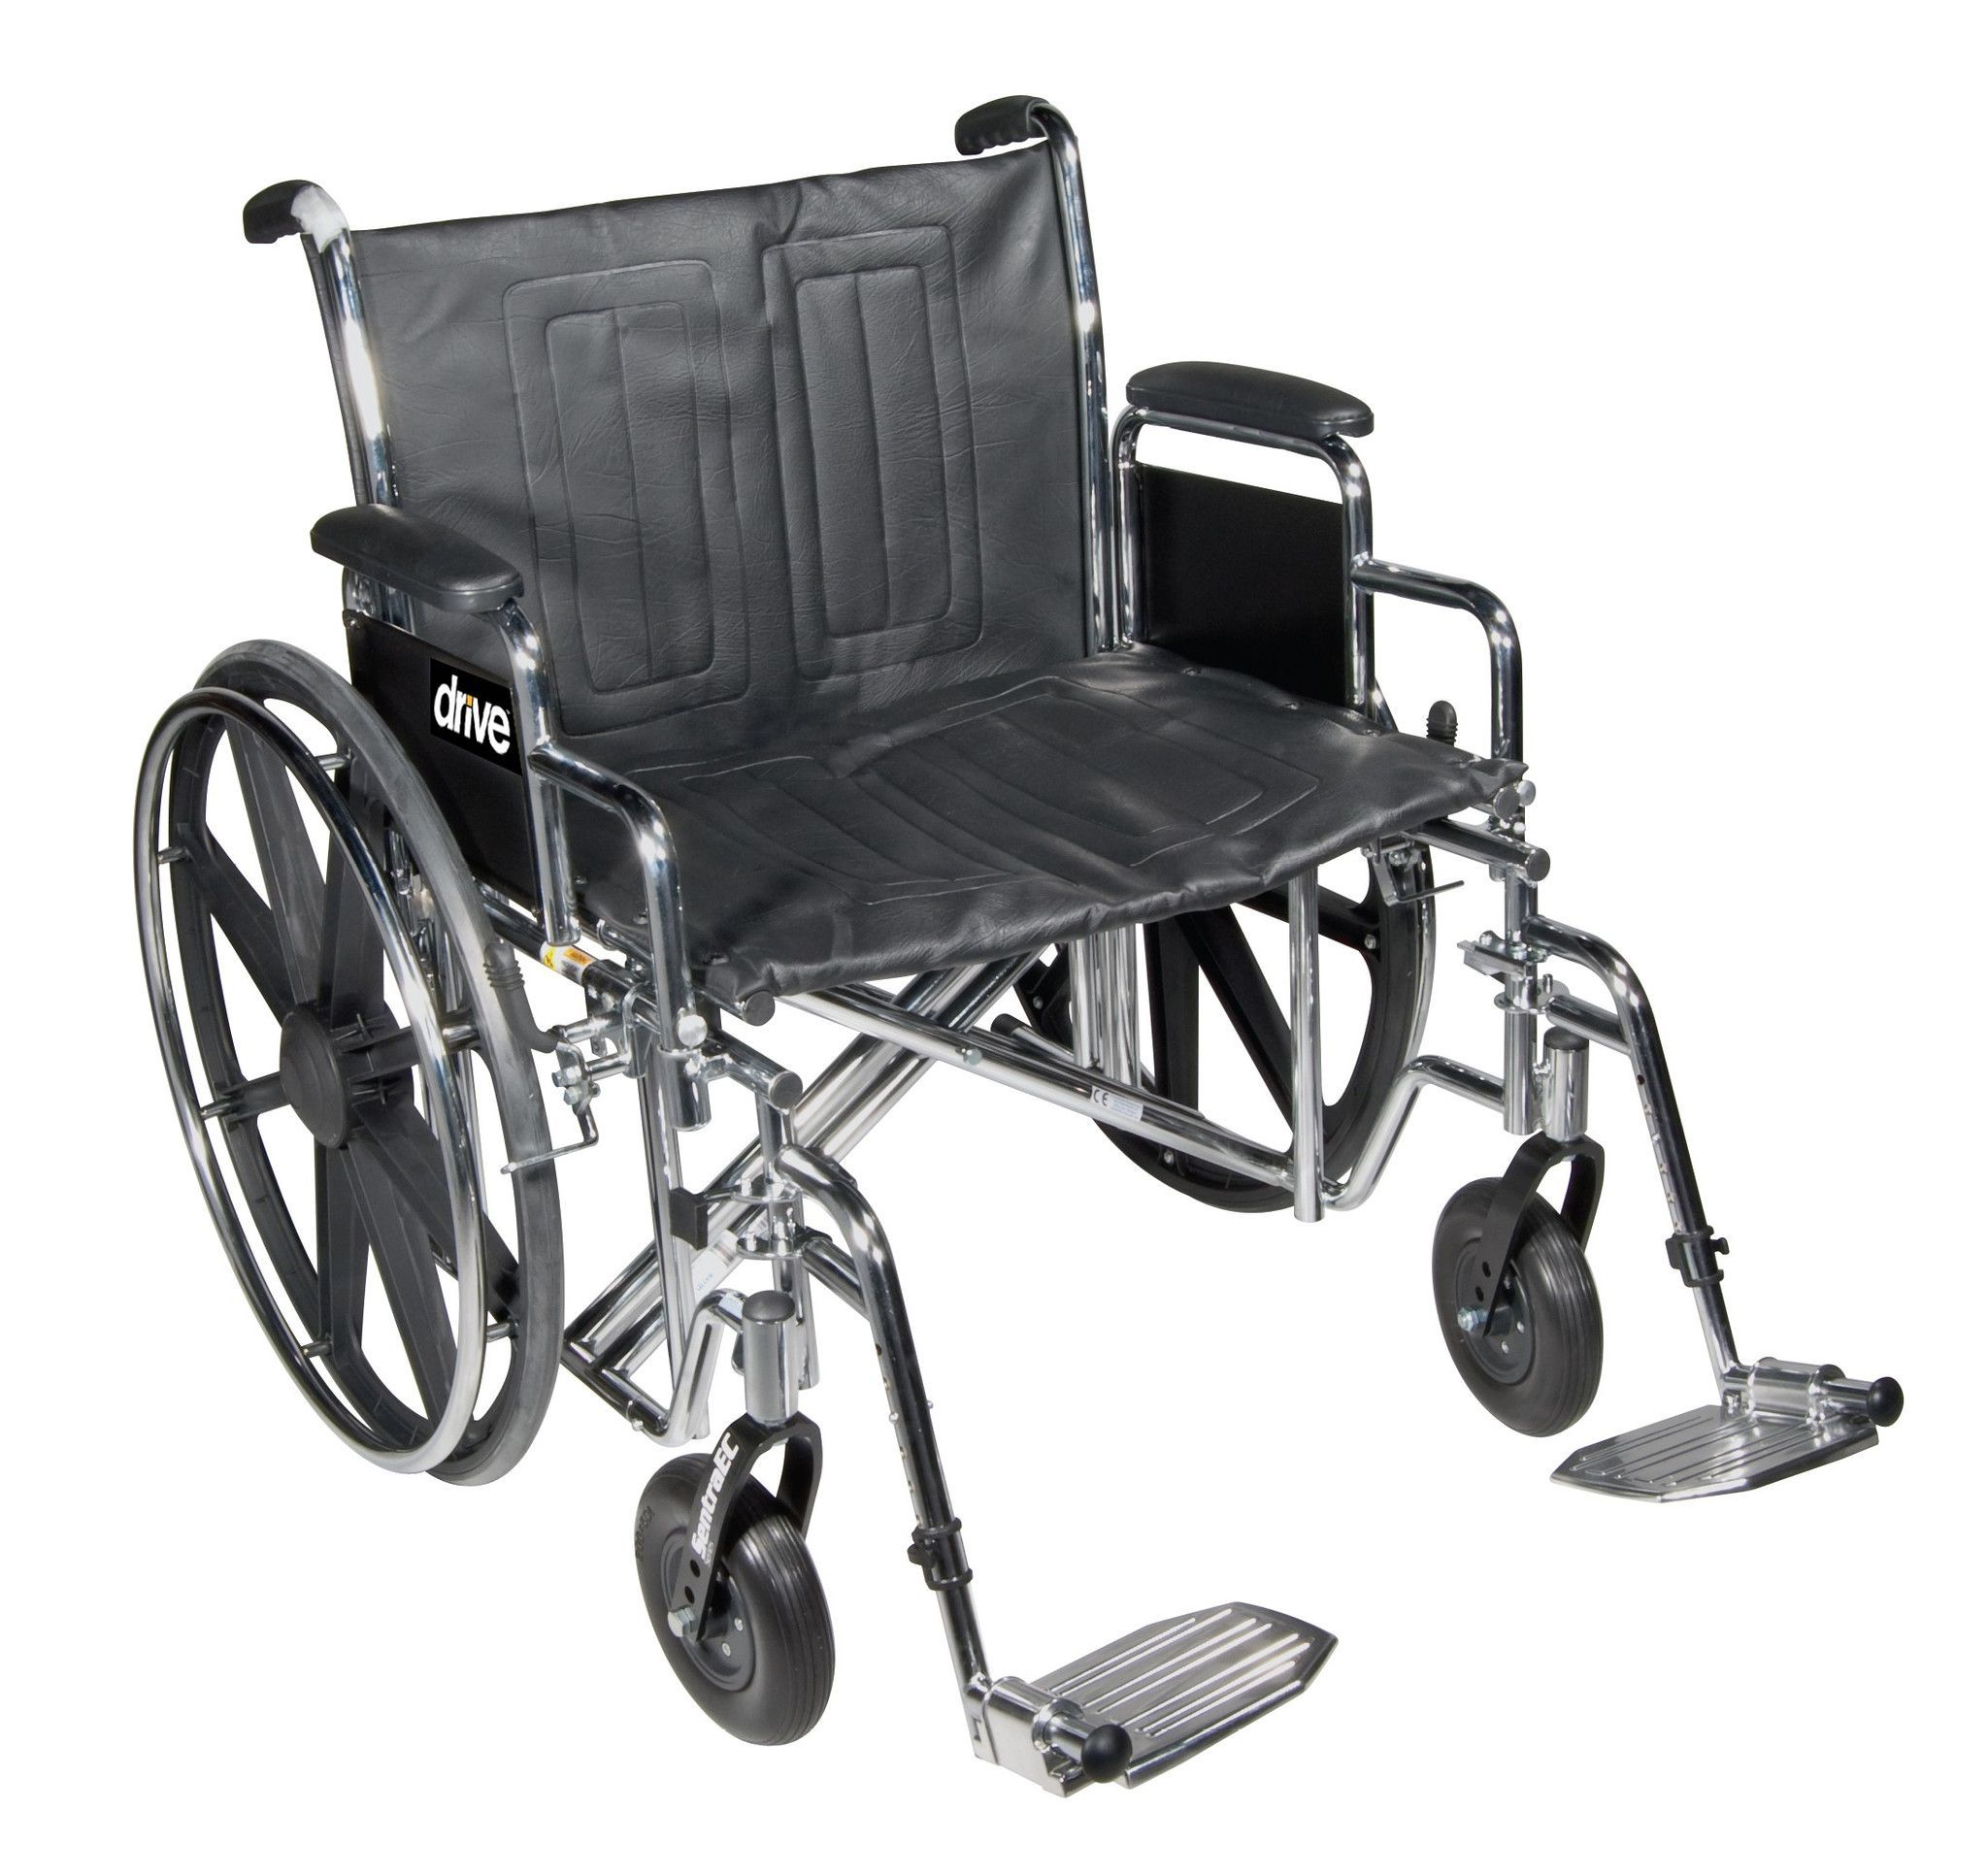 Bariatric Sentra Ec HeavyDuty Wheelchair looking at